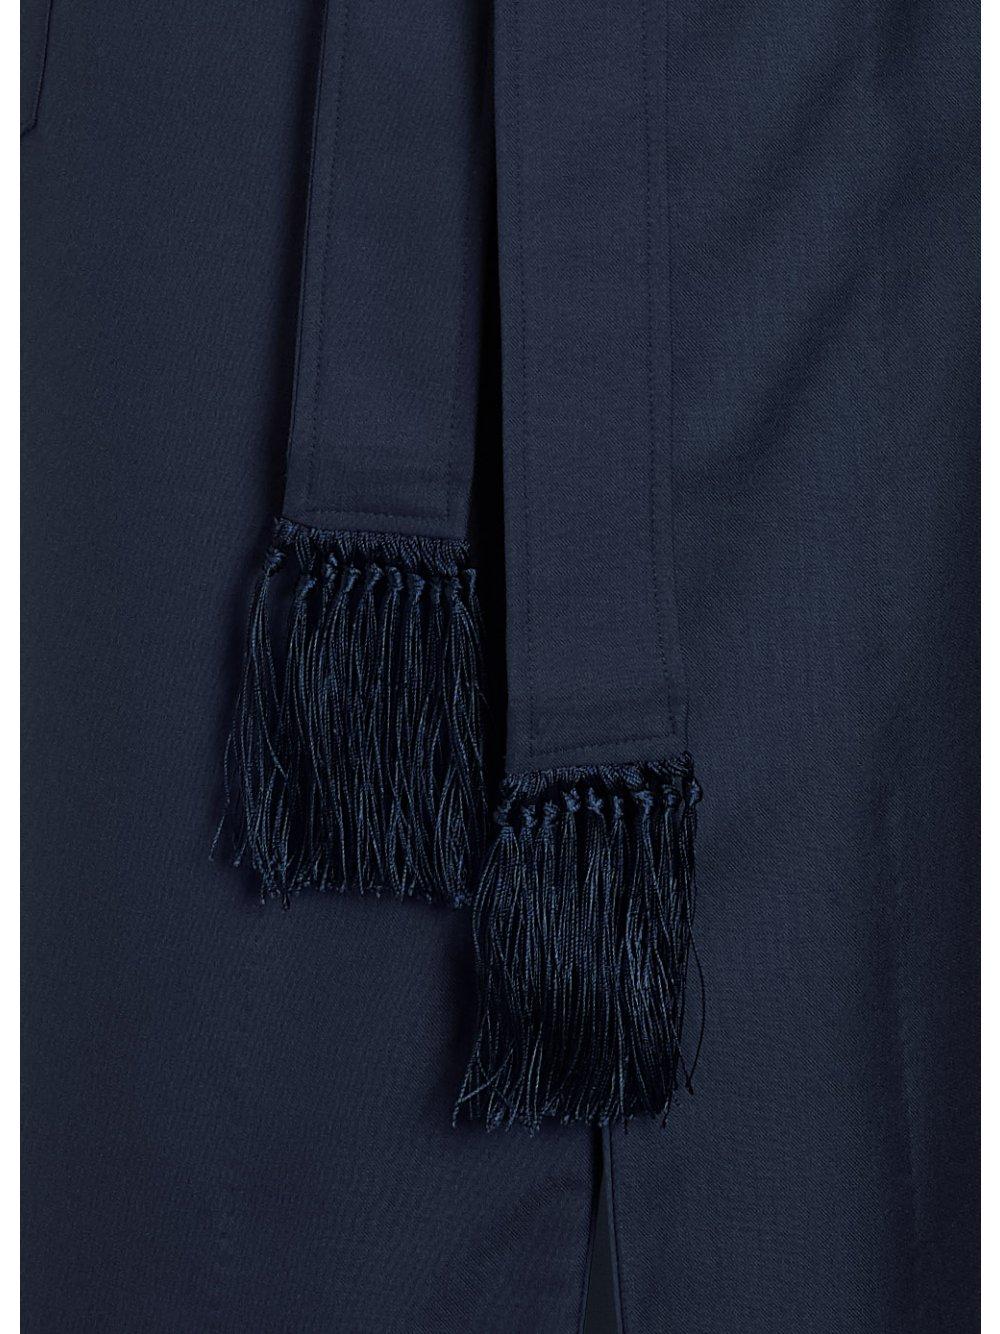 Sherlock Holmes\'s Dressing Gown - I Hear of Sherlock Everywhere